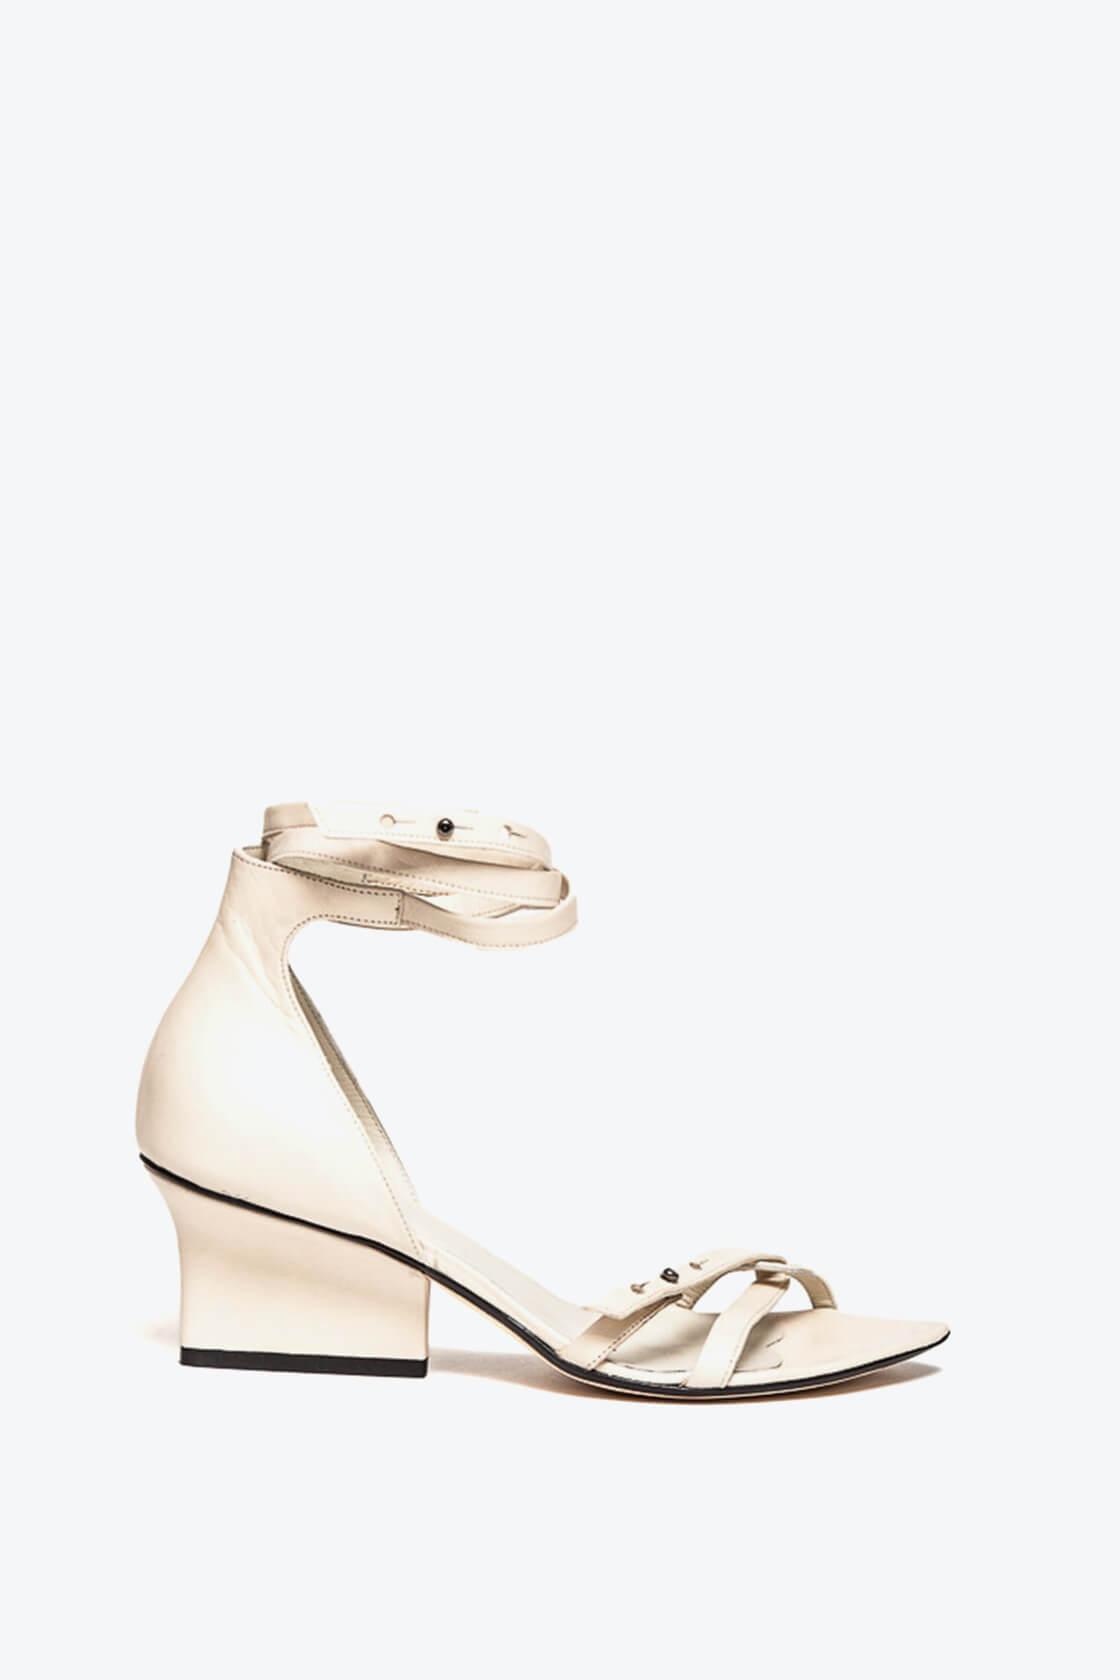 EJK0000009 Sid strappy sandals cream 1